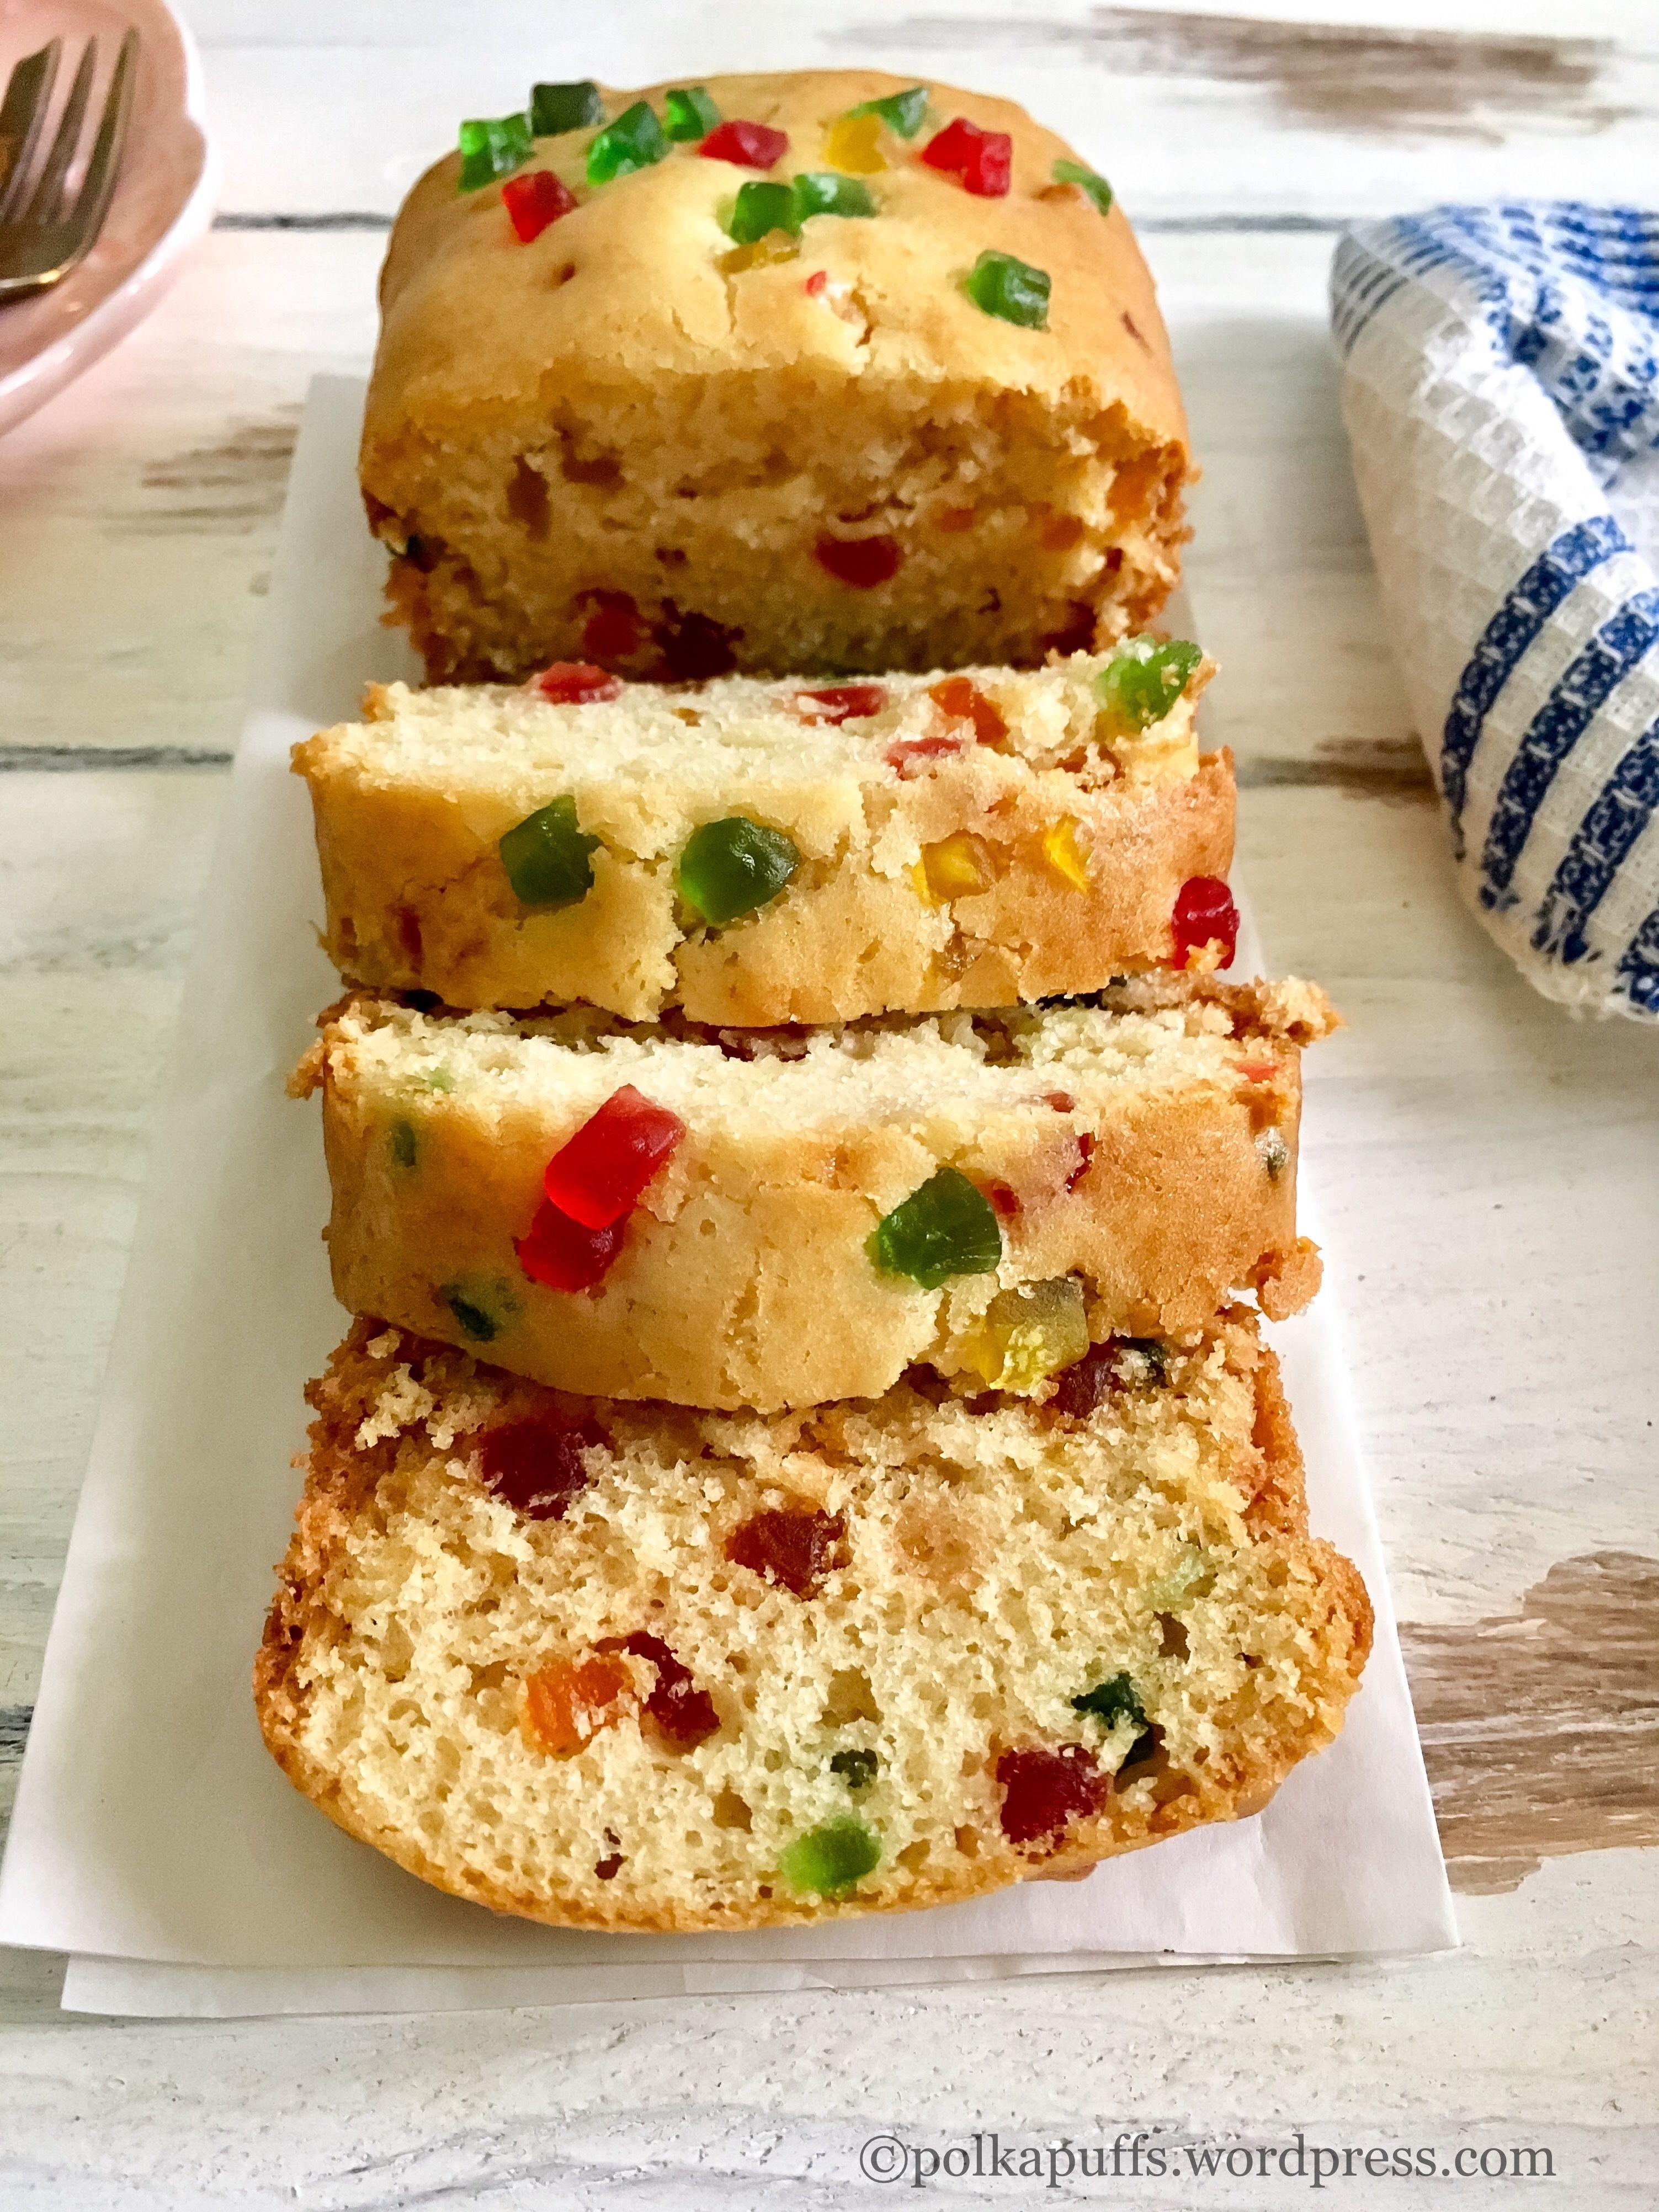 Egg Free Butter Free Tutti Frutti Cake Everyday Tea Time Delight Recipe Fruit Recipes Eggless Recipes Recipes